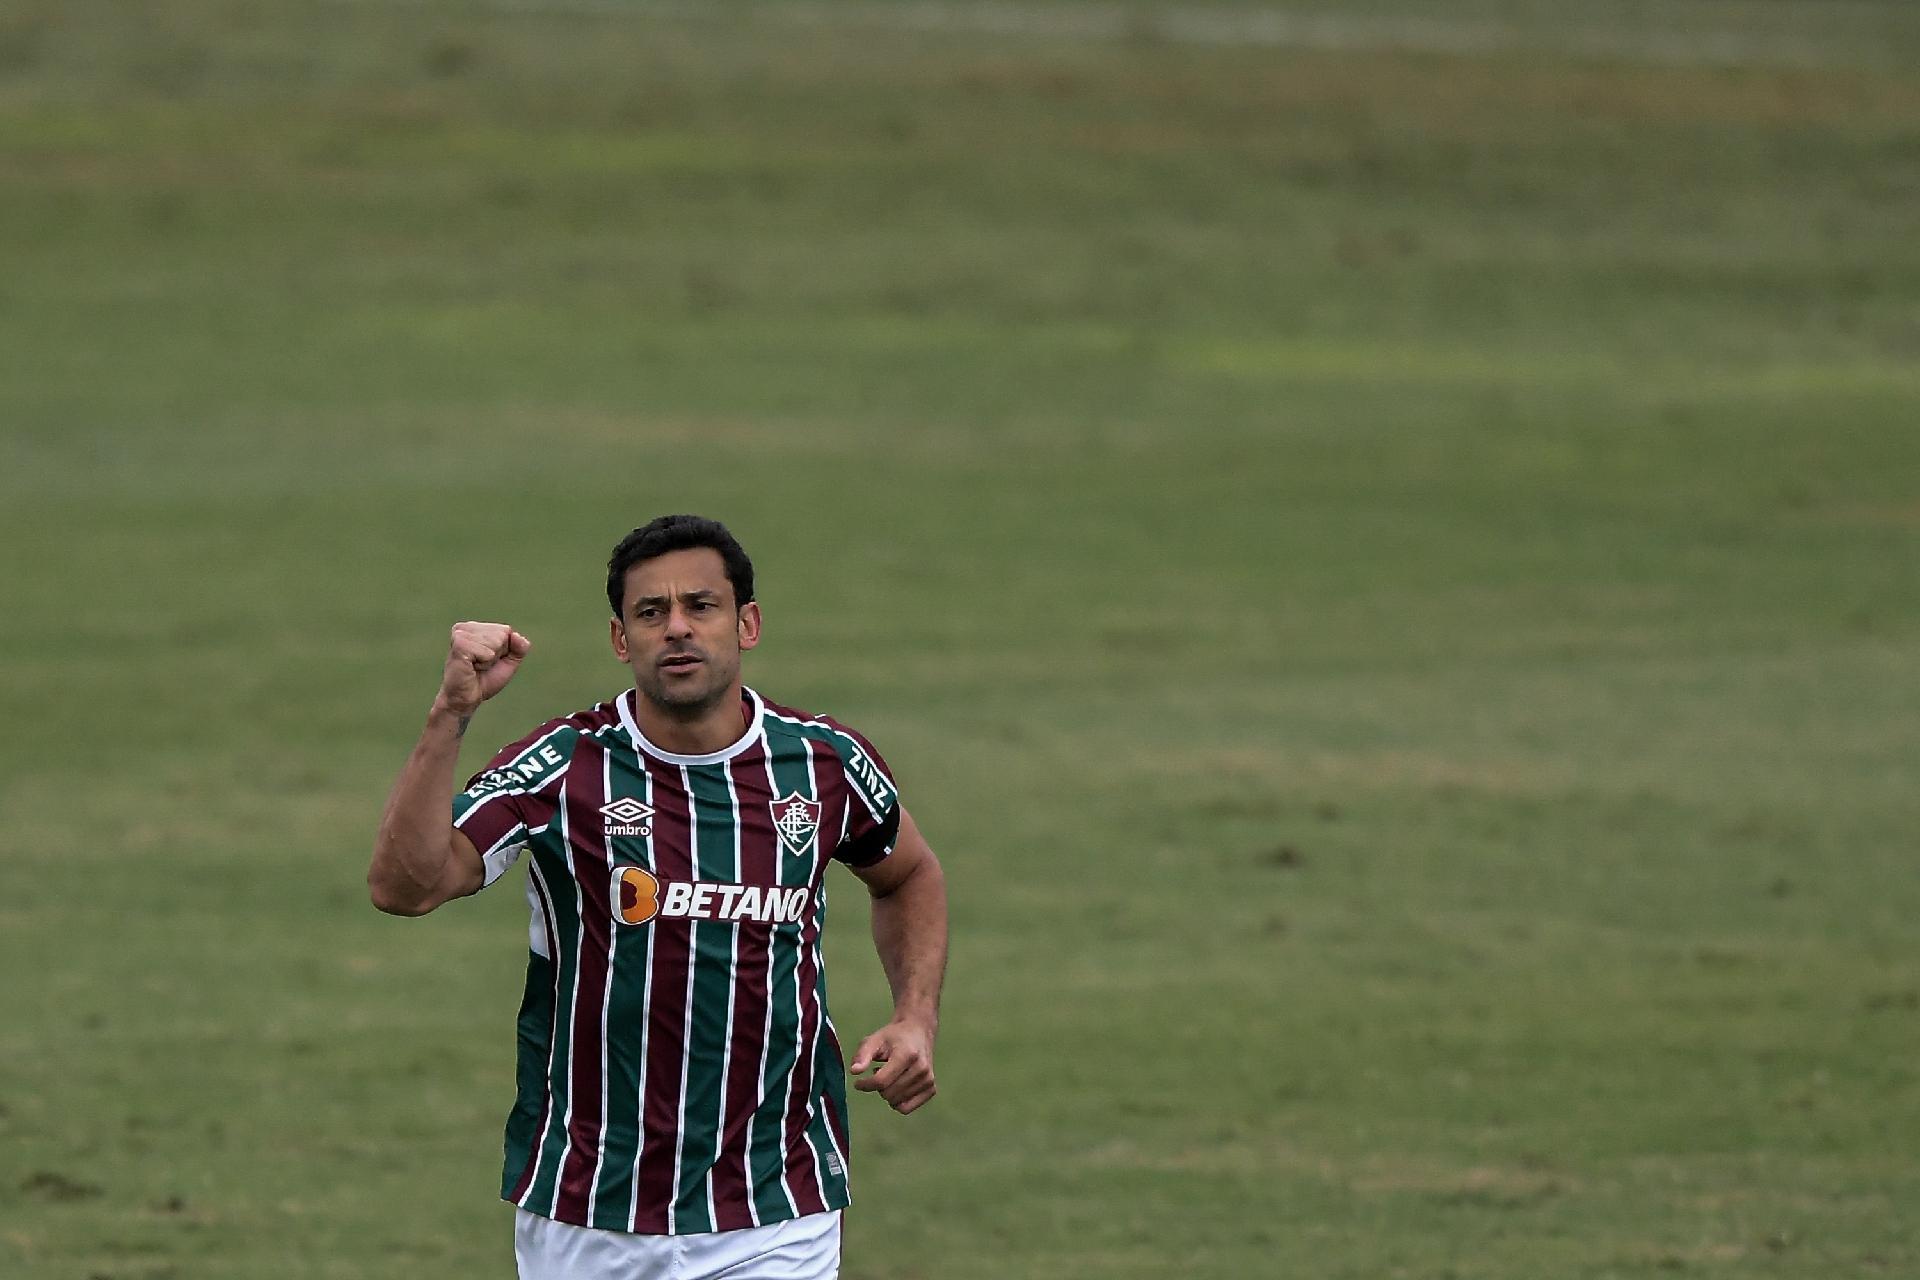 Fred jogador do Fluminense comemora seu gol durante partida contra o Athletico-PR no estadio Raulino de Oliveira pelo campeonato Brasileiro A 2021